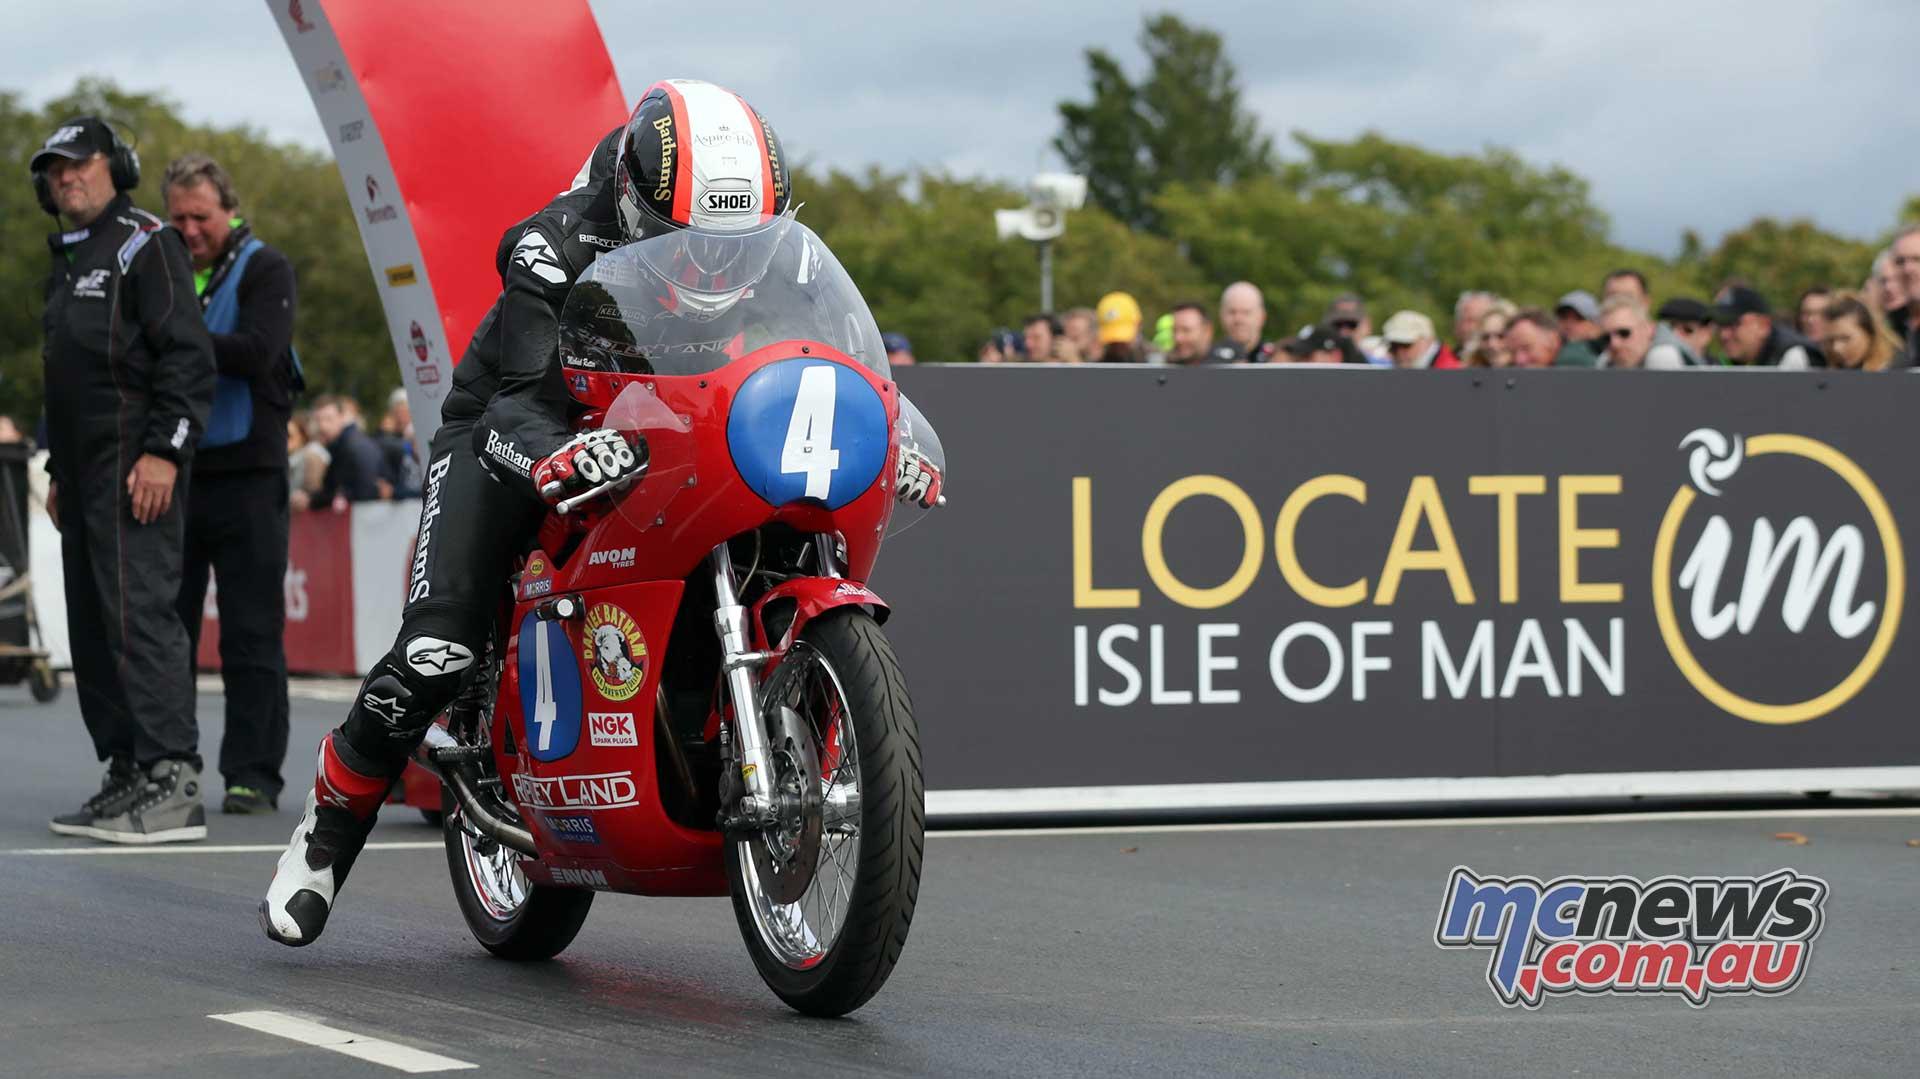 Classic TT Junior Michael Rutter